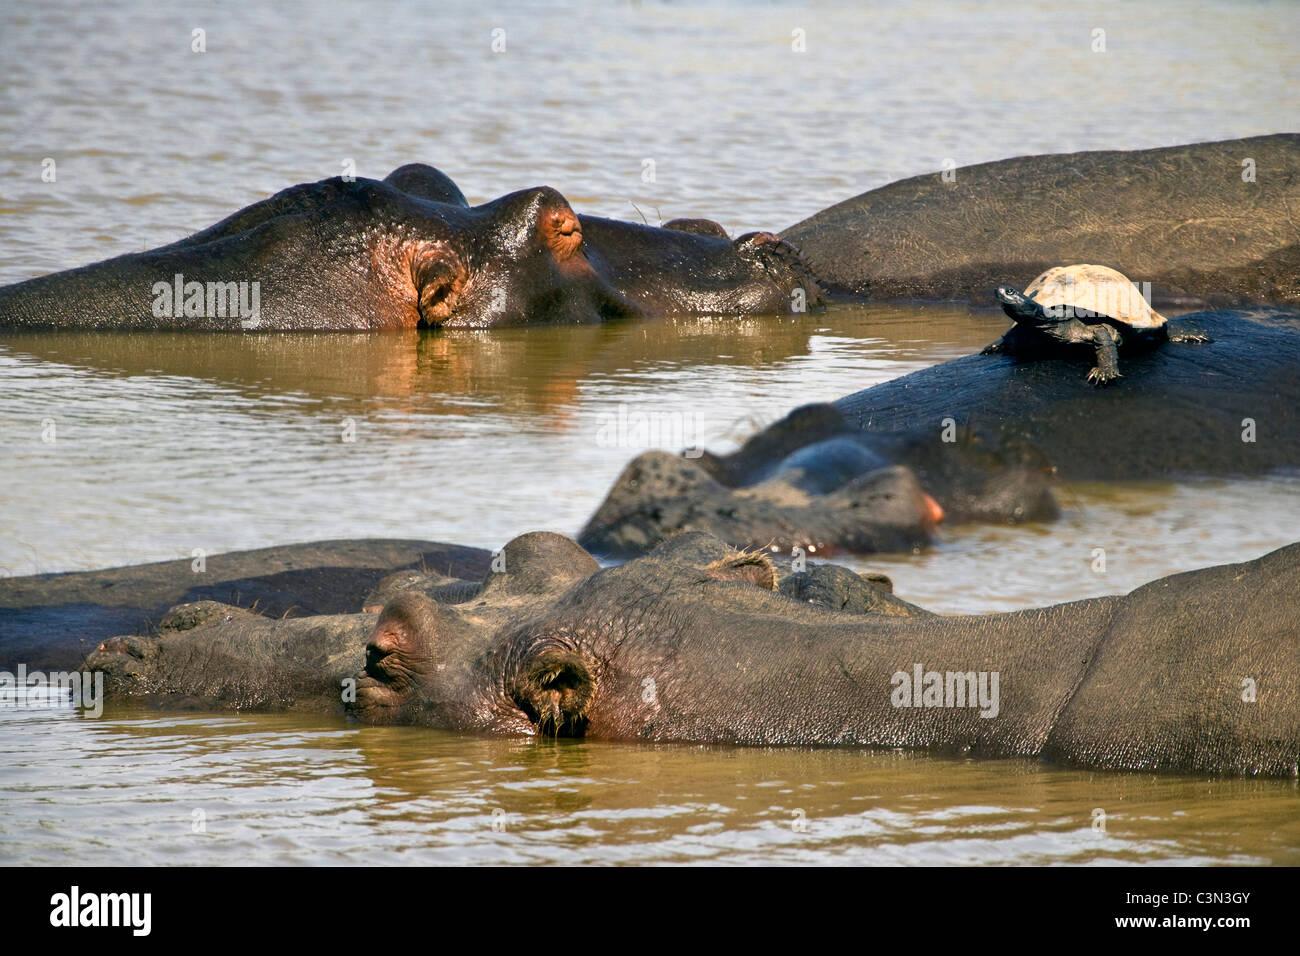 South Africa, near Rustenburg, Pilanesberg National Park. Hippos, Hippopotamus, Hippopotamus amphibius. Turtle on - Stock Image